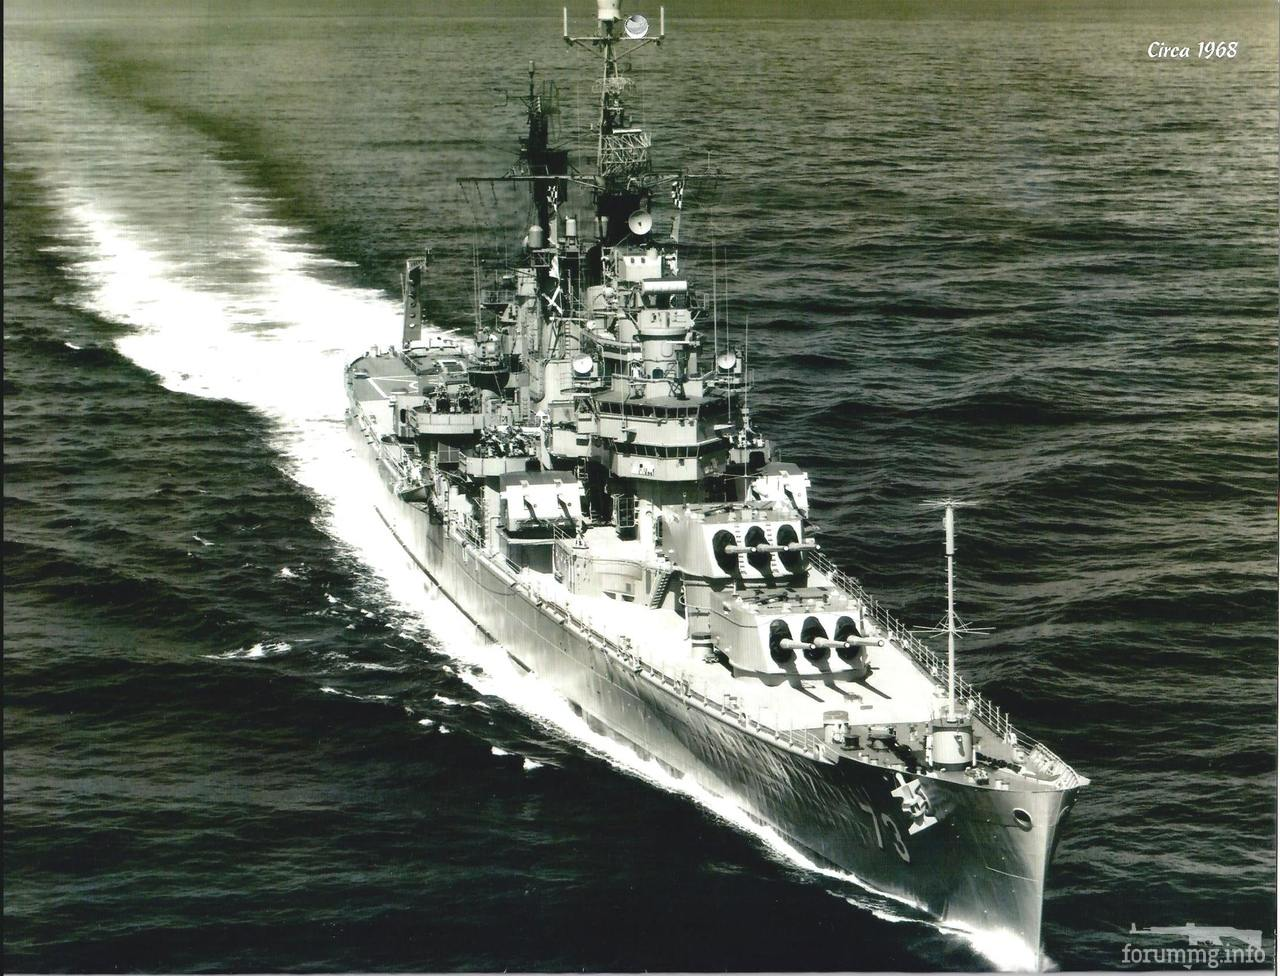 129588 - Тяжелый крейсер USS Saint Paul (CA-73), 1968 г.